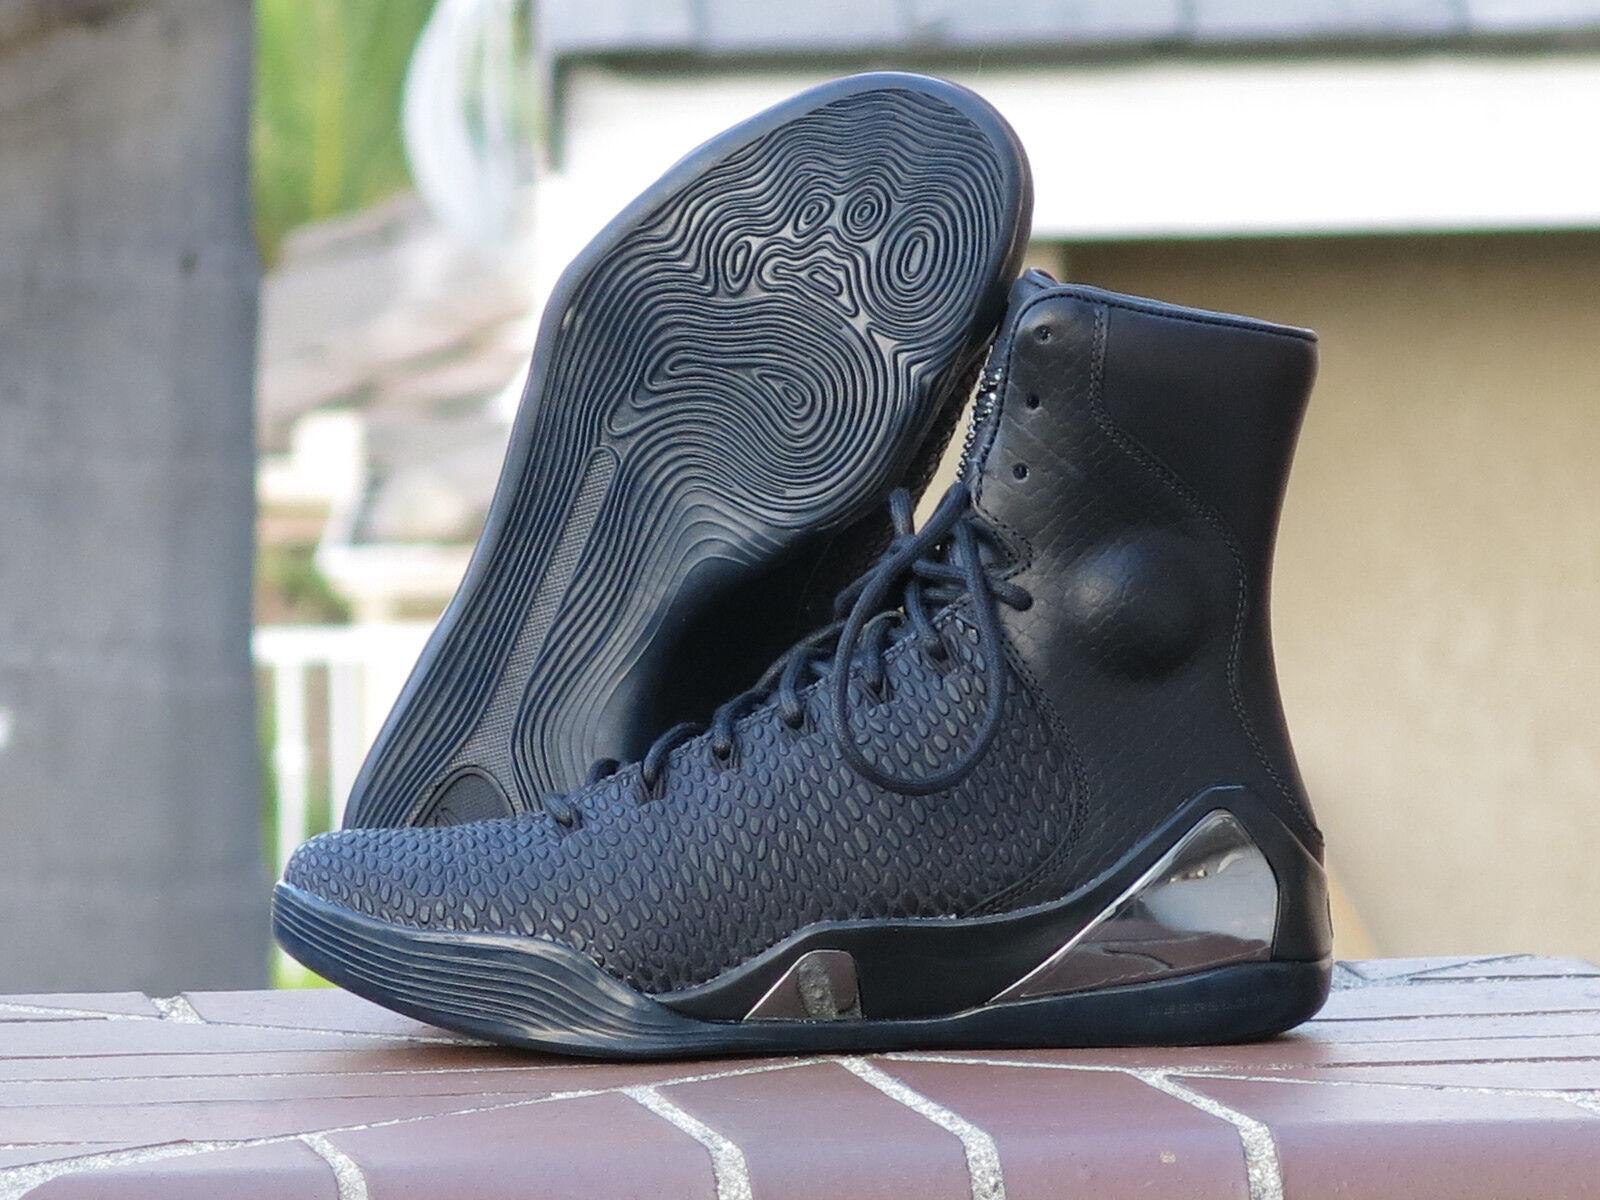 "2014 Nike Kobe 716993-001 IX ""BLACK MAMBA"" Men's Basketball Shoes 716993-001 Kobe SZ 9 8f585d"